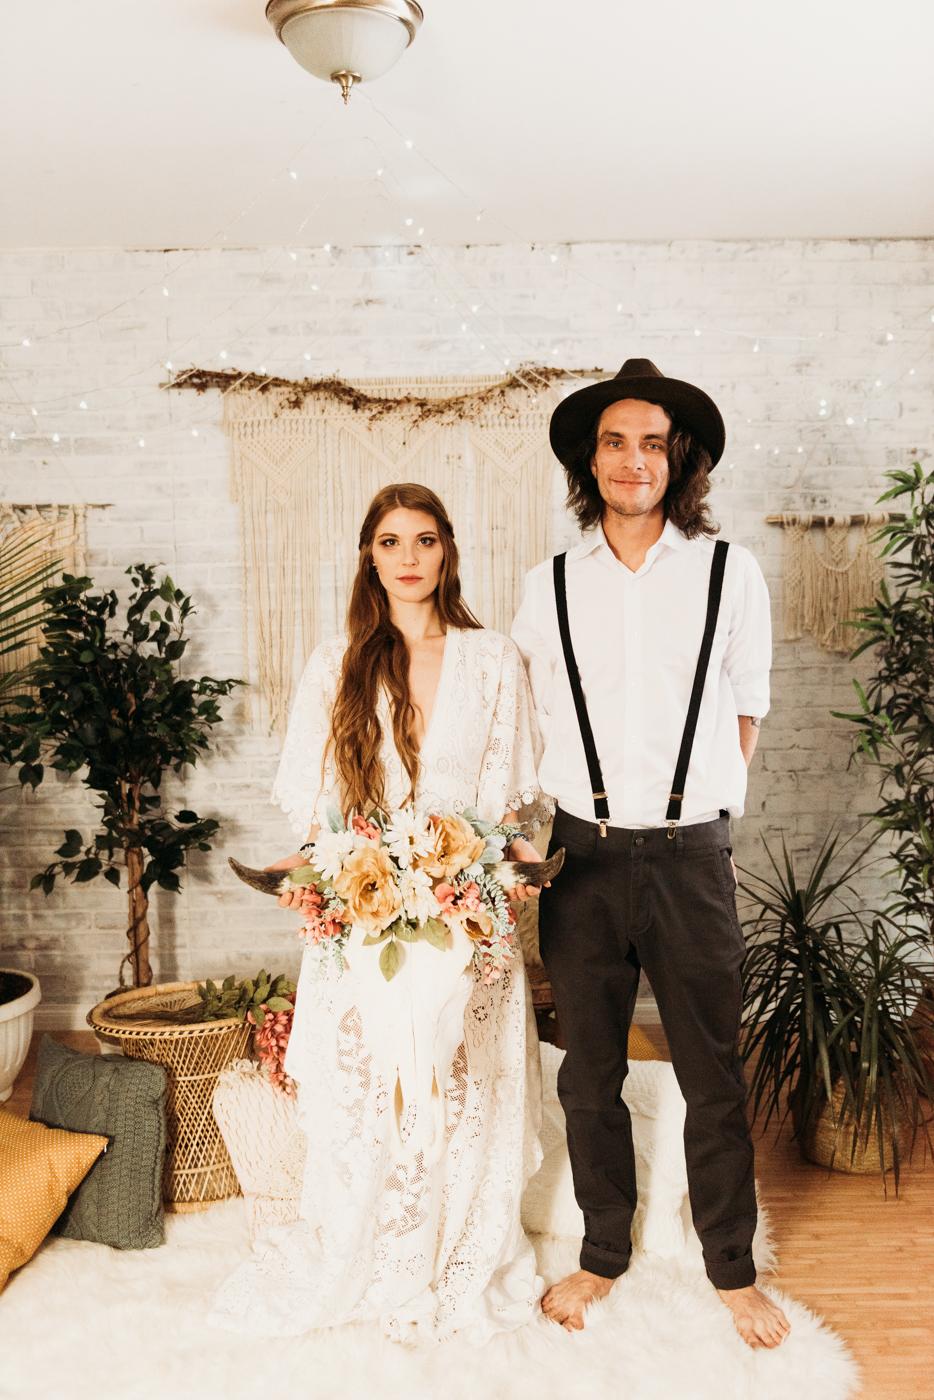 FortSt.John_photographer_TyraEPhotography_Wedding_Couple_Family_Photograhy_DawsonCreek_Elopement_Bride_Boduoir_Portraits-1-3.jpg